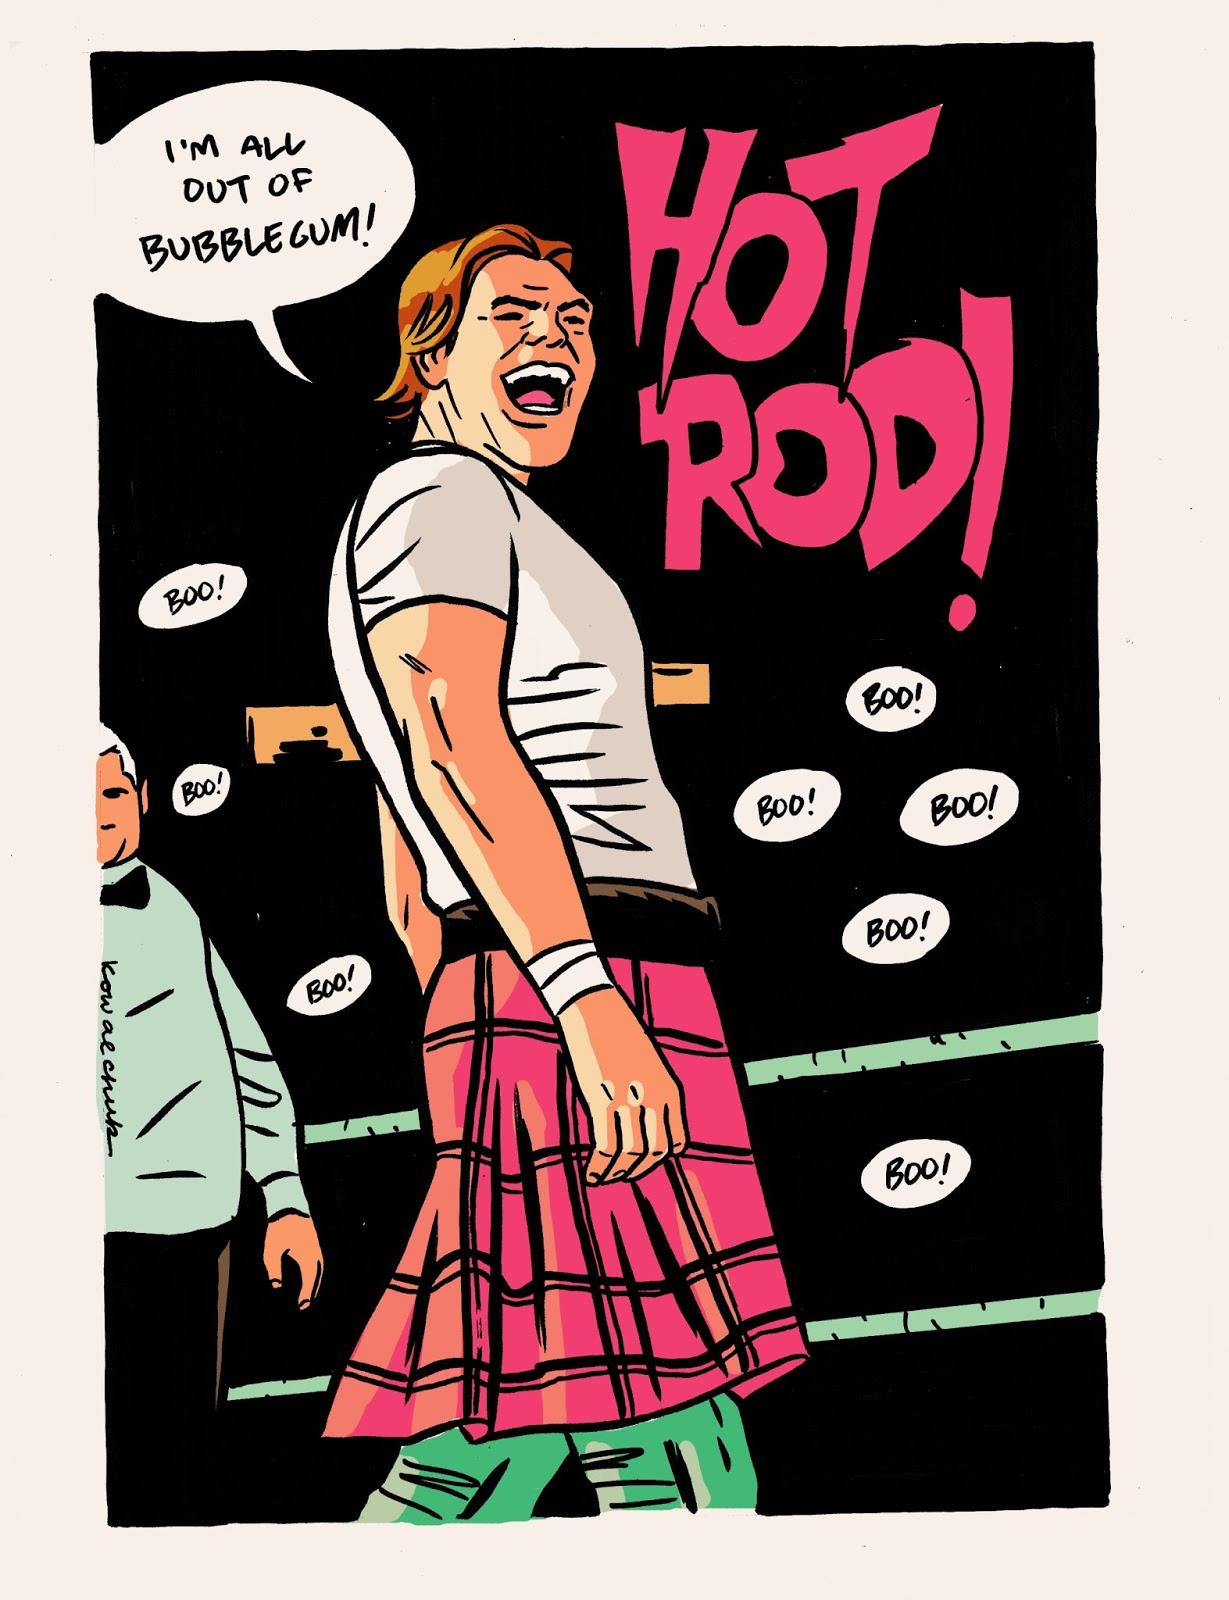 Roddy piper hot rod logo